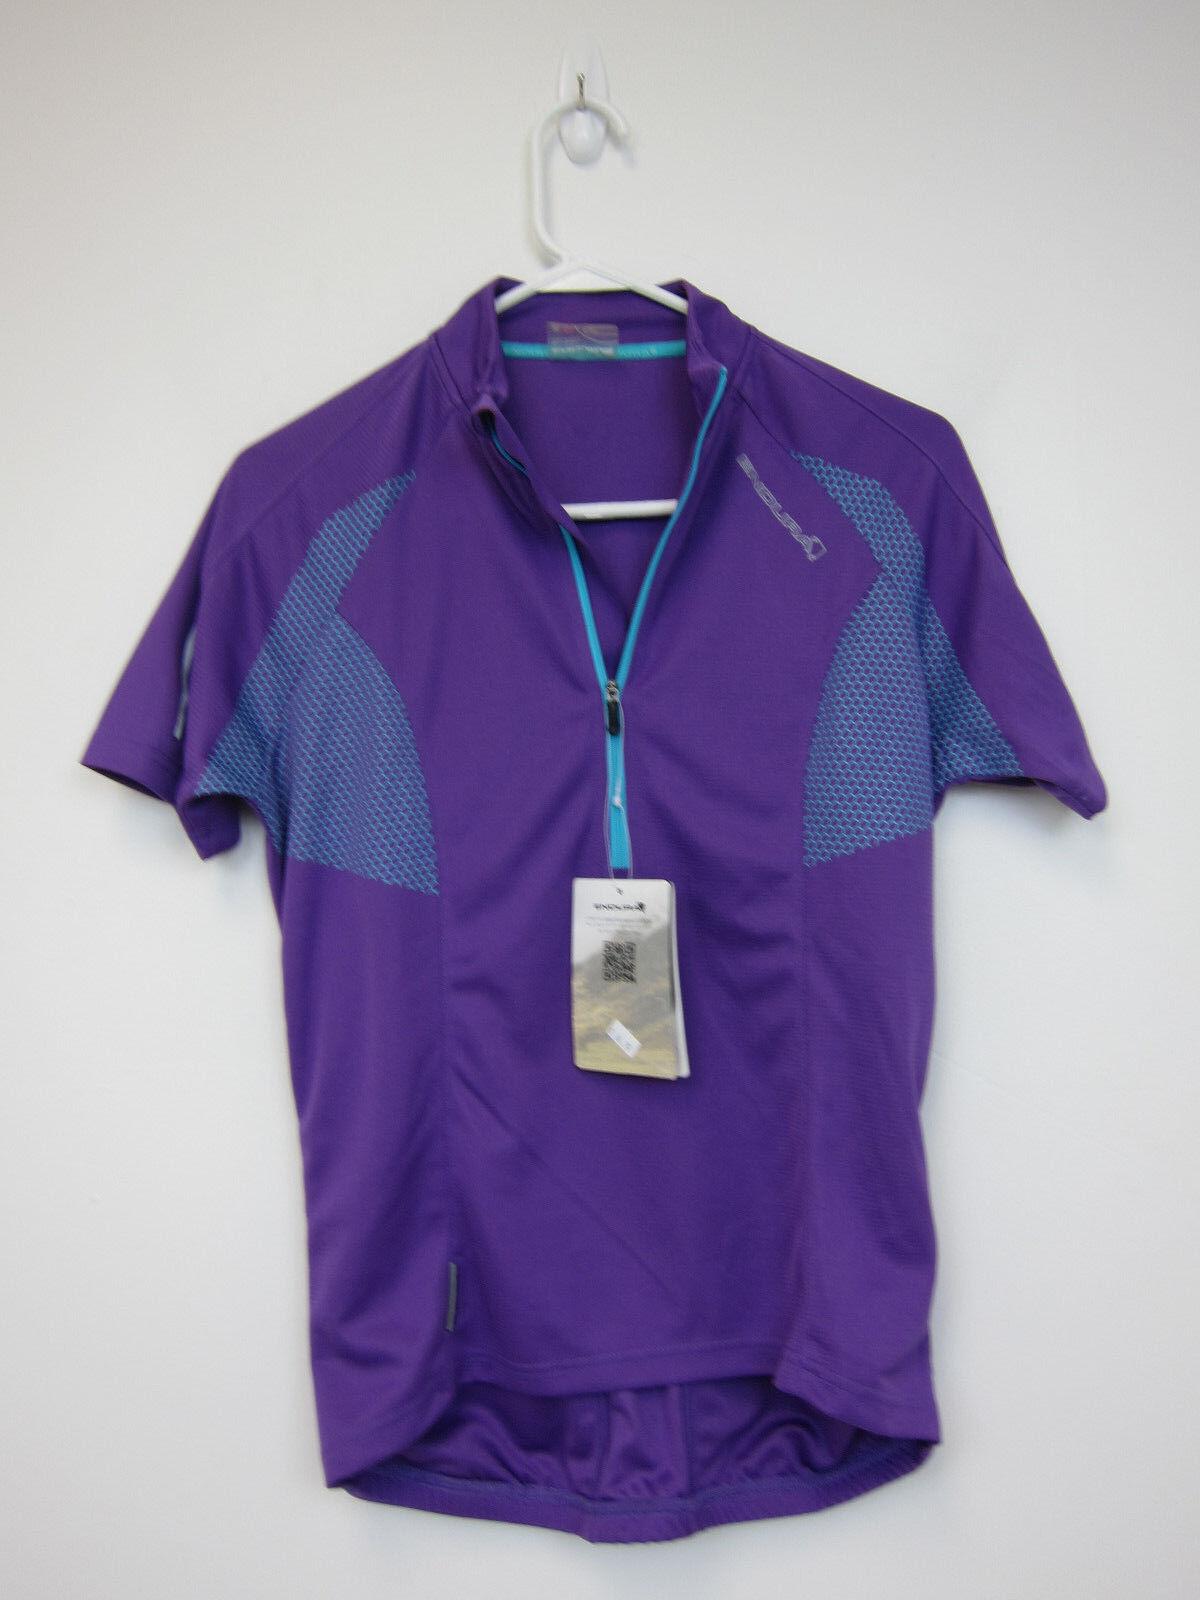 Endura Xtract Short Sleeve Jersey - Womens Medium - purplec - NWT